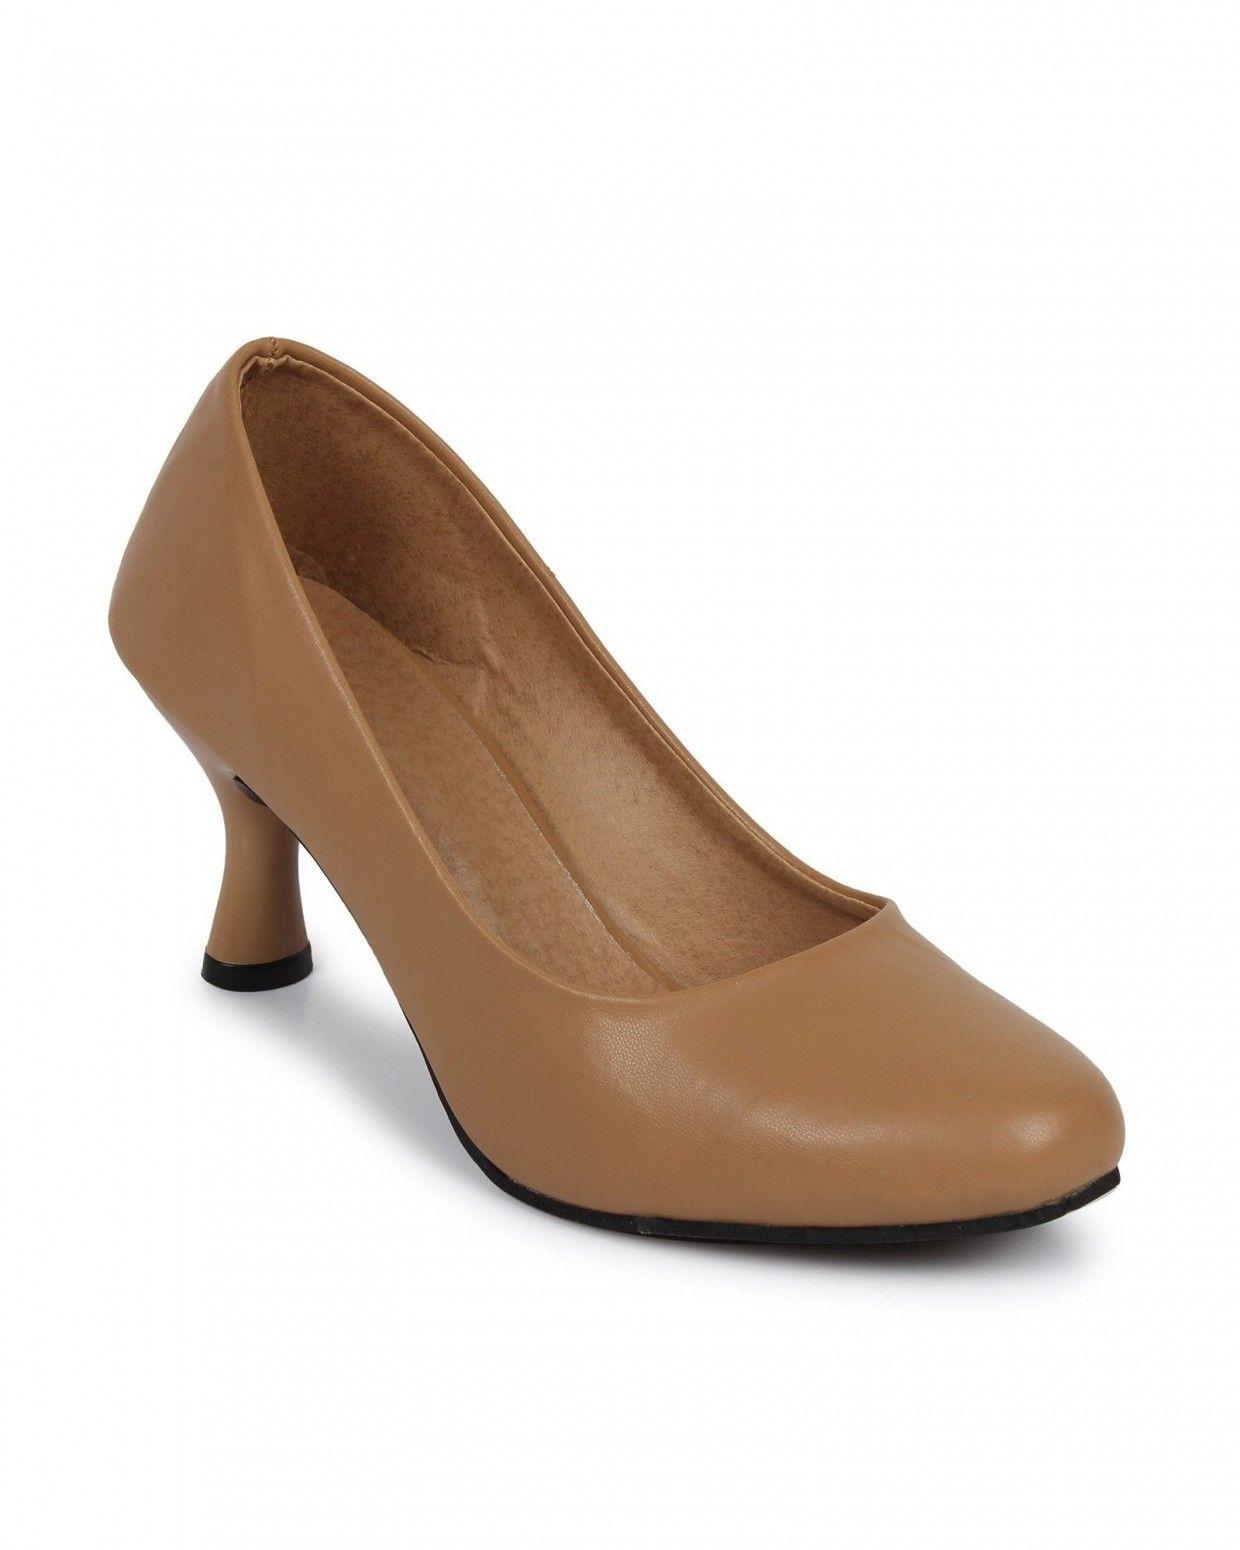 Brown Color Strappy Heels Sandals Heels Strappy Sandals Heels